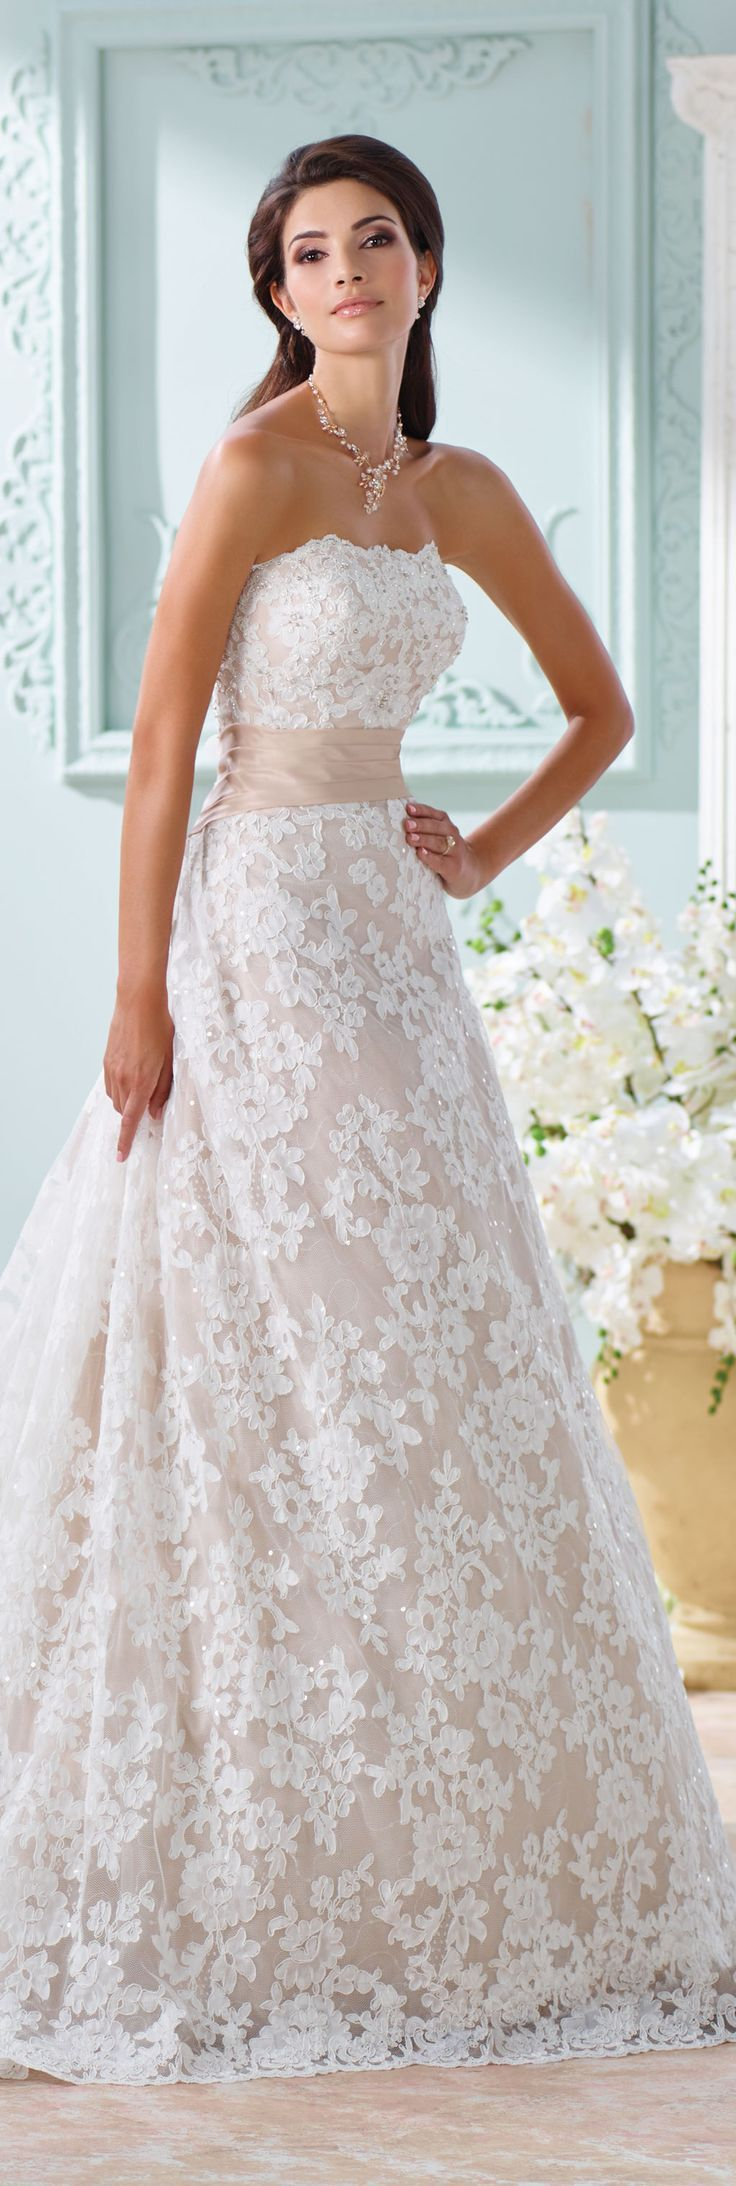 Lace wedding dresses the david tutera for mon cheri spring